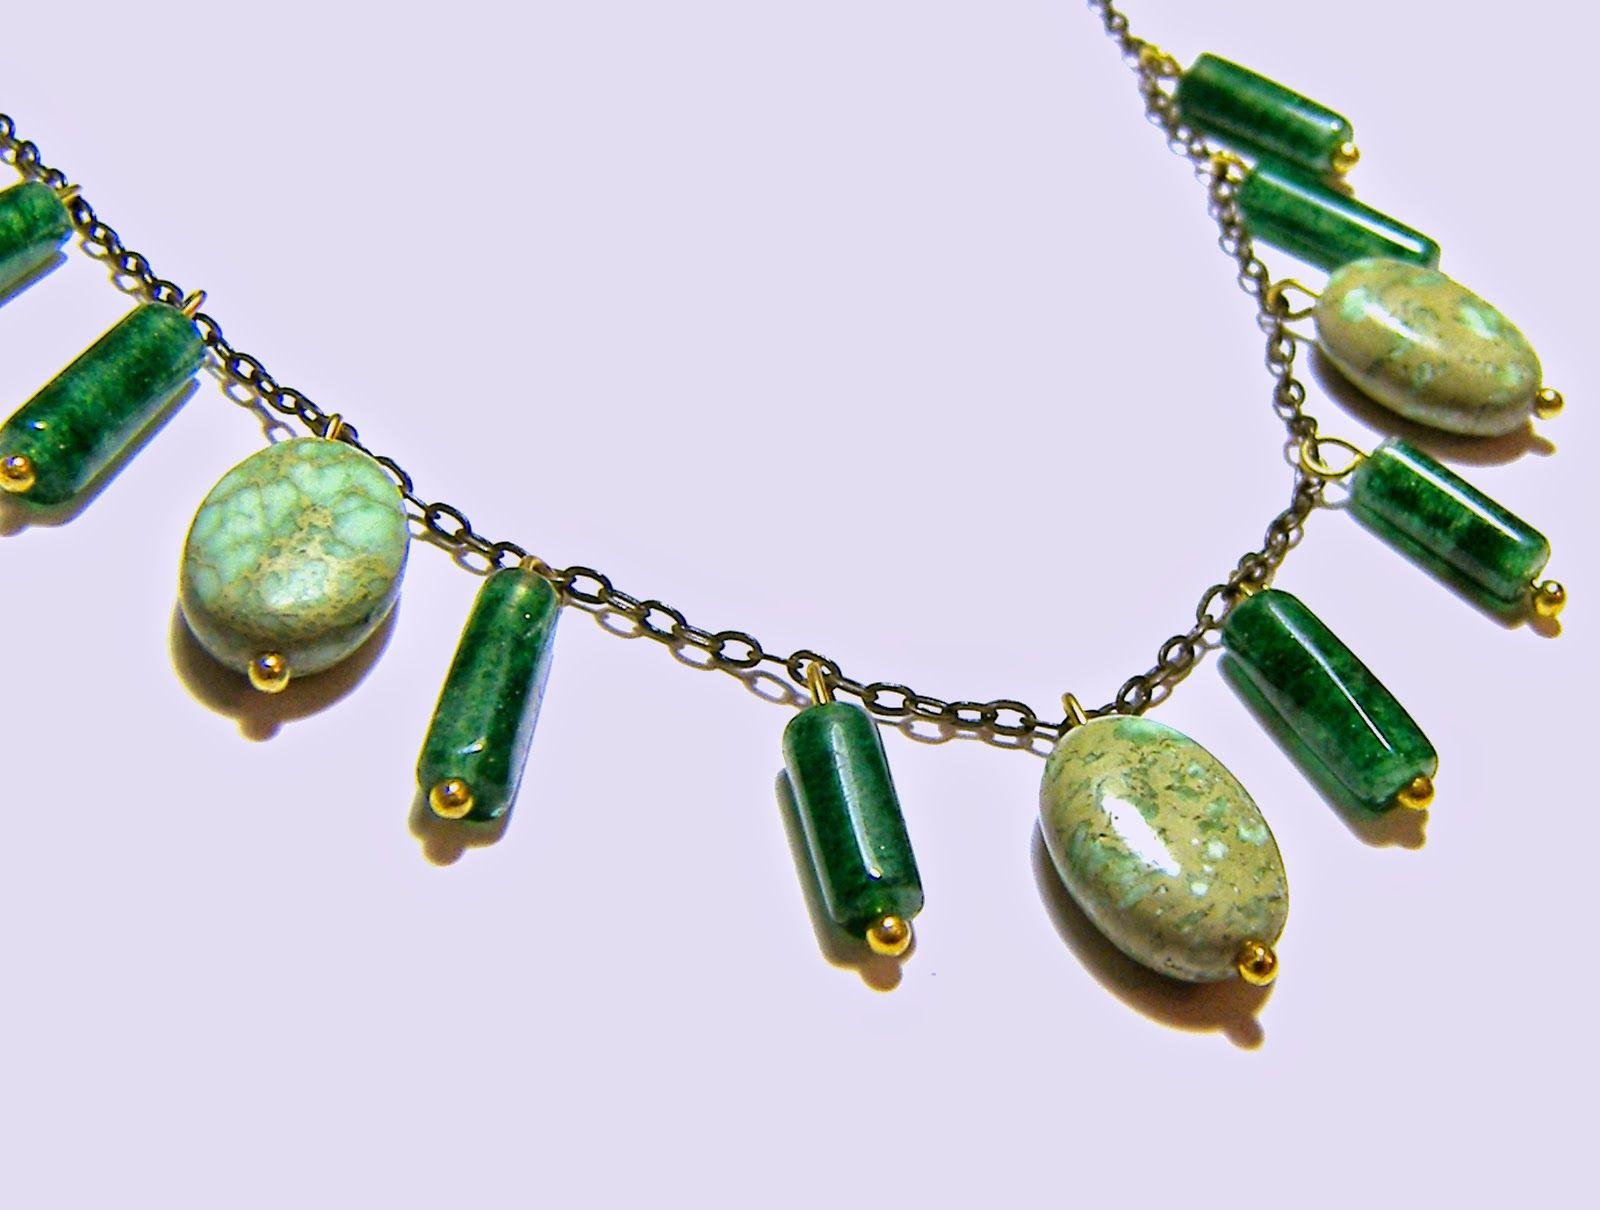 Luna Essence Handmade Artistic Jewelry : October 23, 2014 Happy Solar Eclipse in Scorpio ! ...